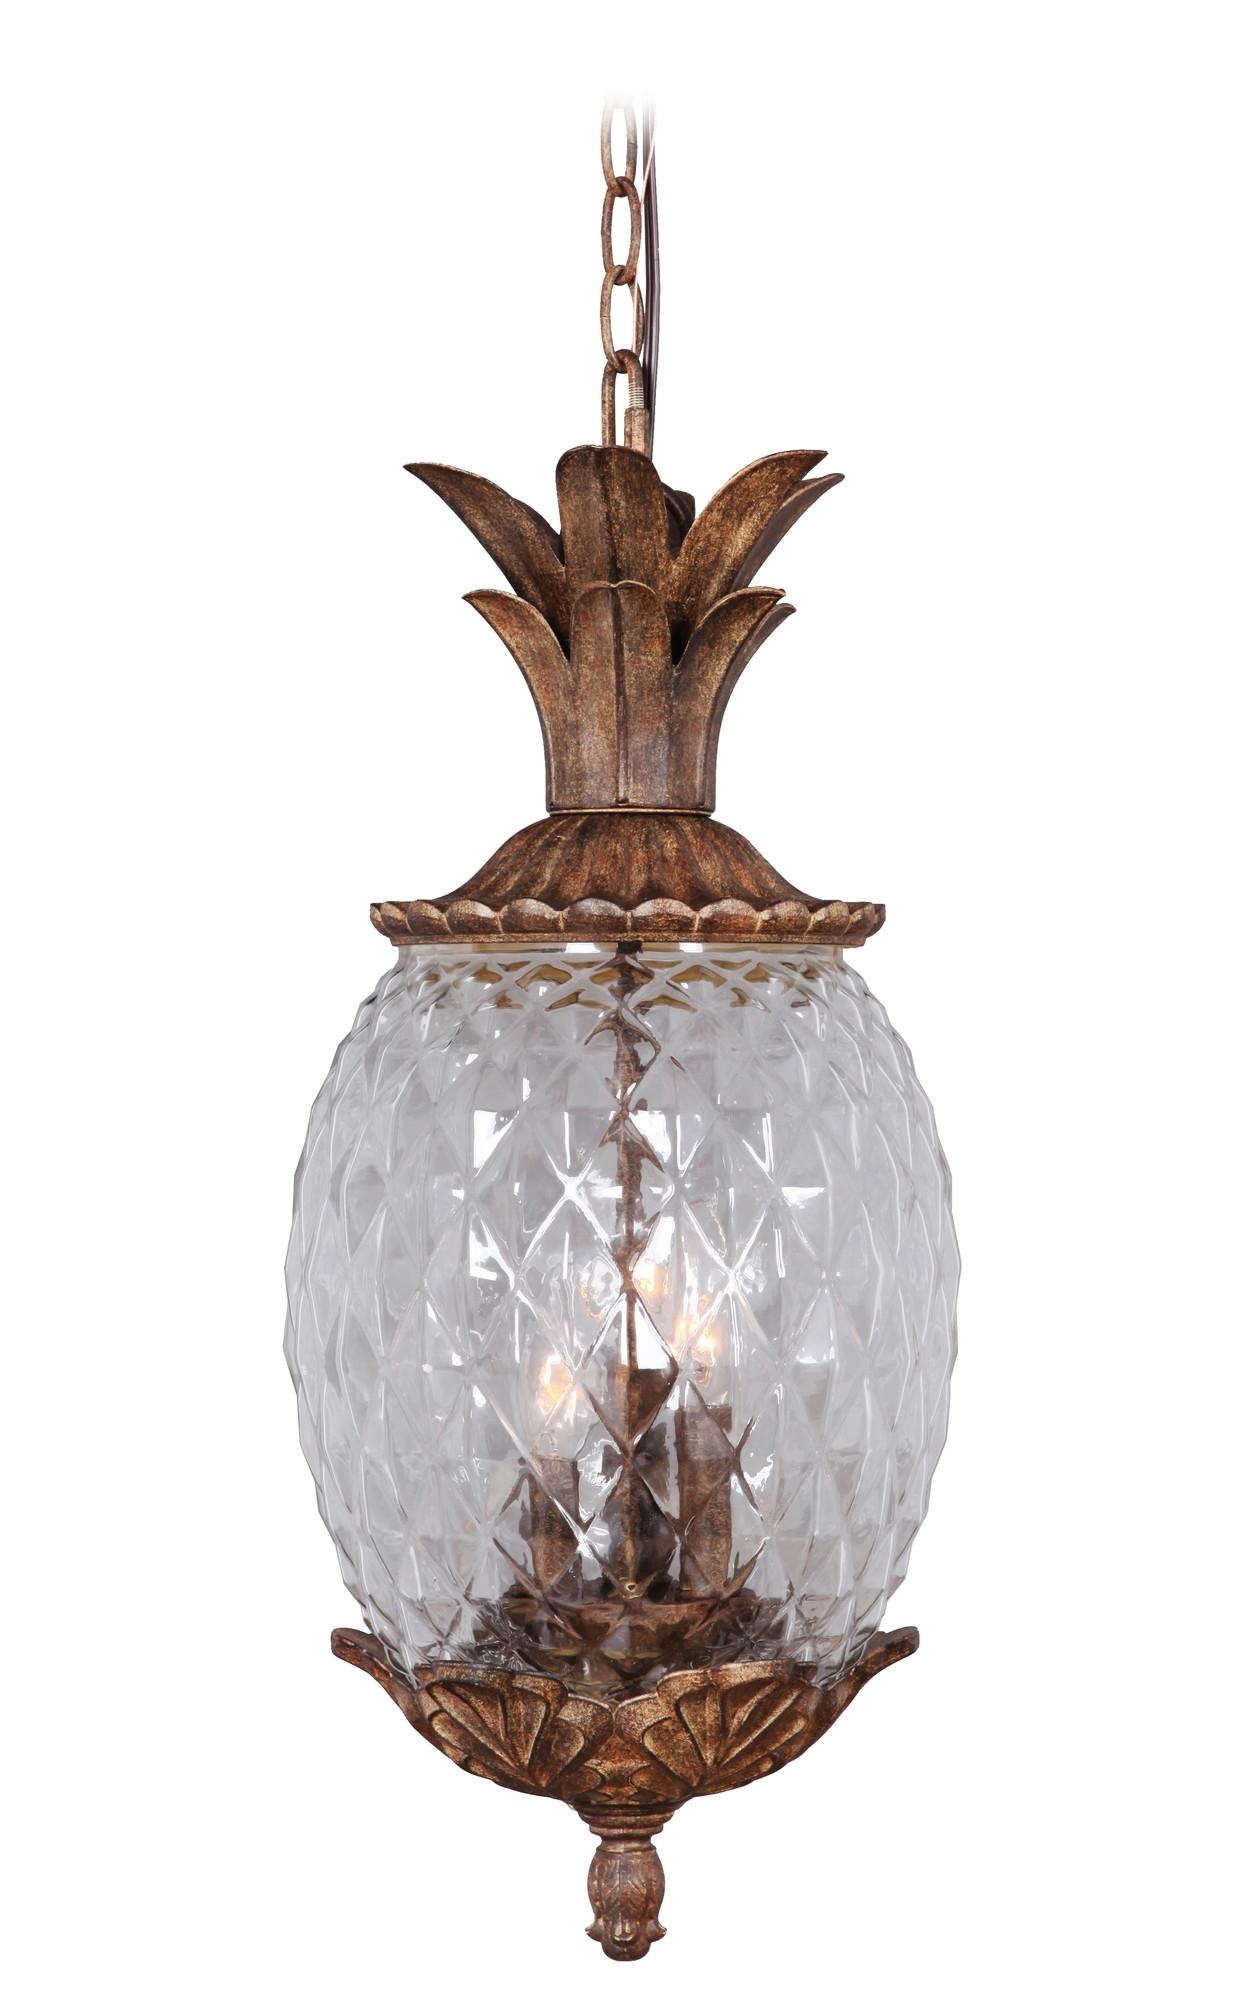 Marianahome Pineapple 3 Light Pendant & Reviews | Wayfair | Lighting Inside Modern Hampton Bay Outdoor Lighting At Wayfair (#12 of 15)